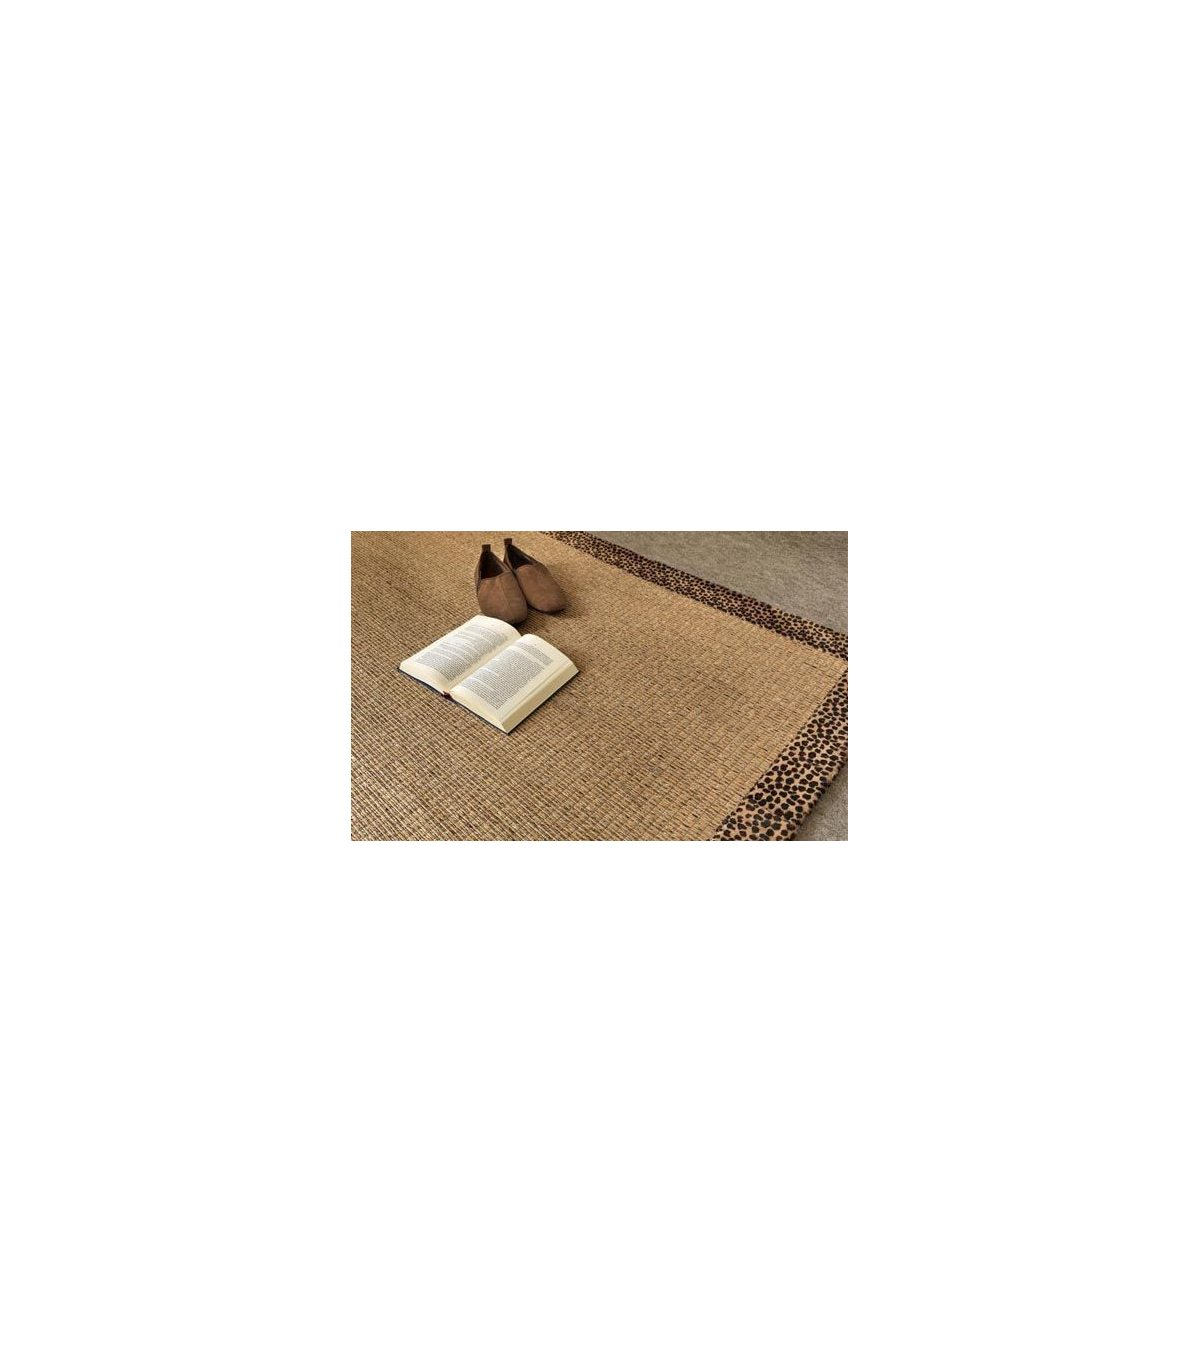 color marr/ón claro 50 cm de ancho Papel de piel sint/ética 0,55 mm de grosor 1 m